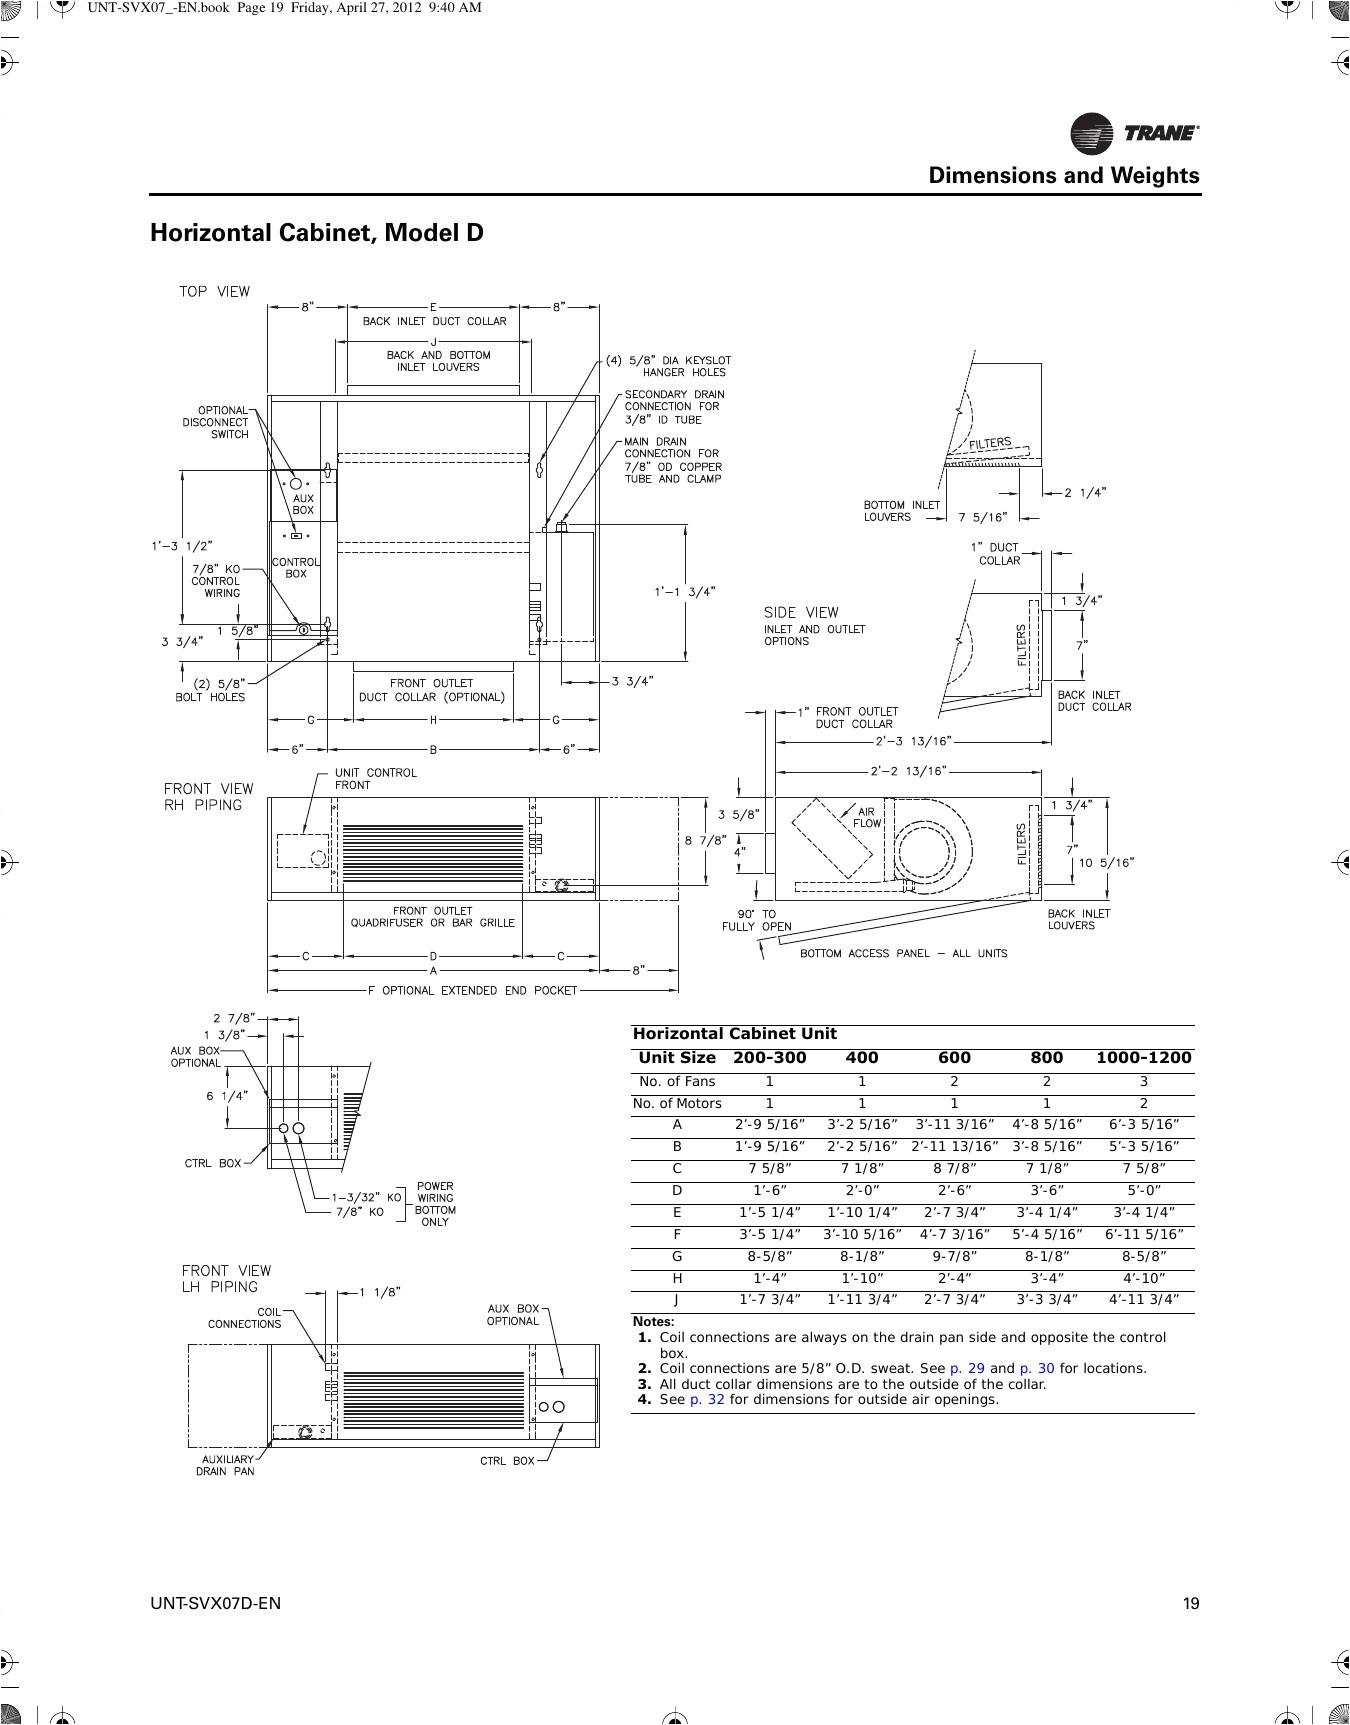 toshiba soft start wiring diagrams wiring diagram rules toshiba soft start wiring diagrams